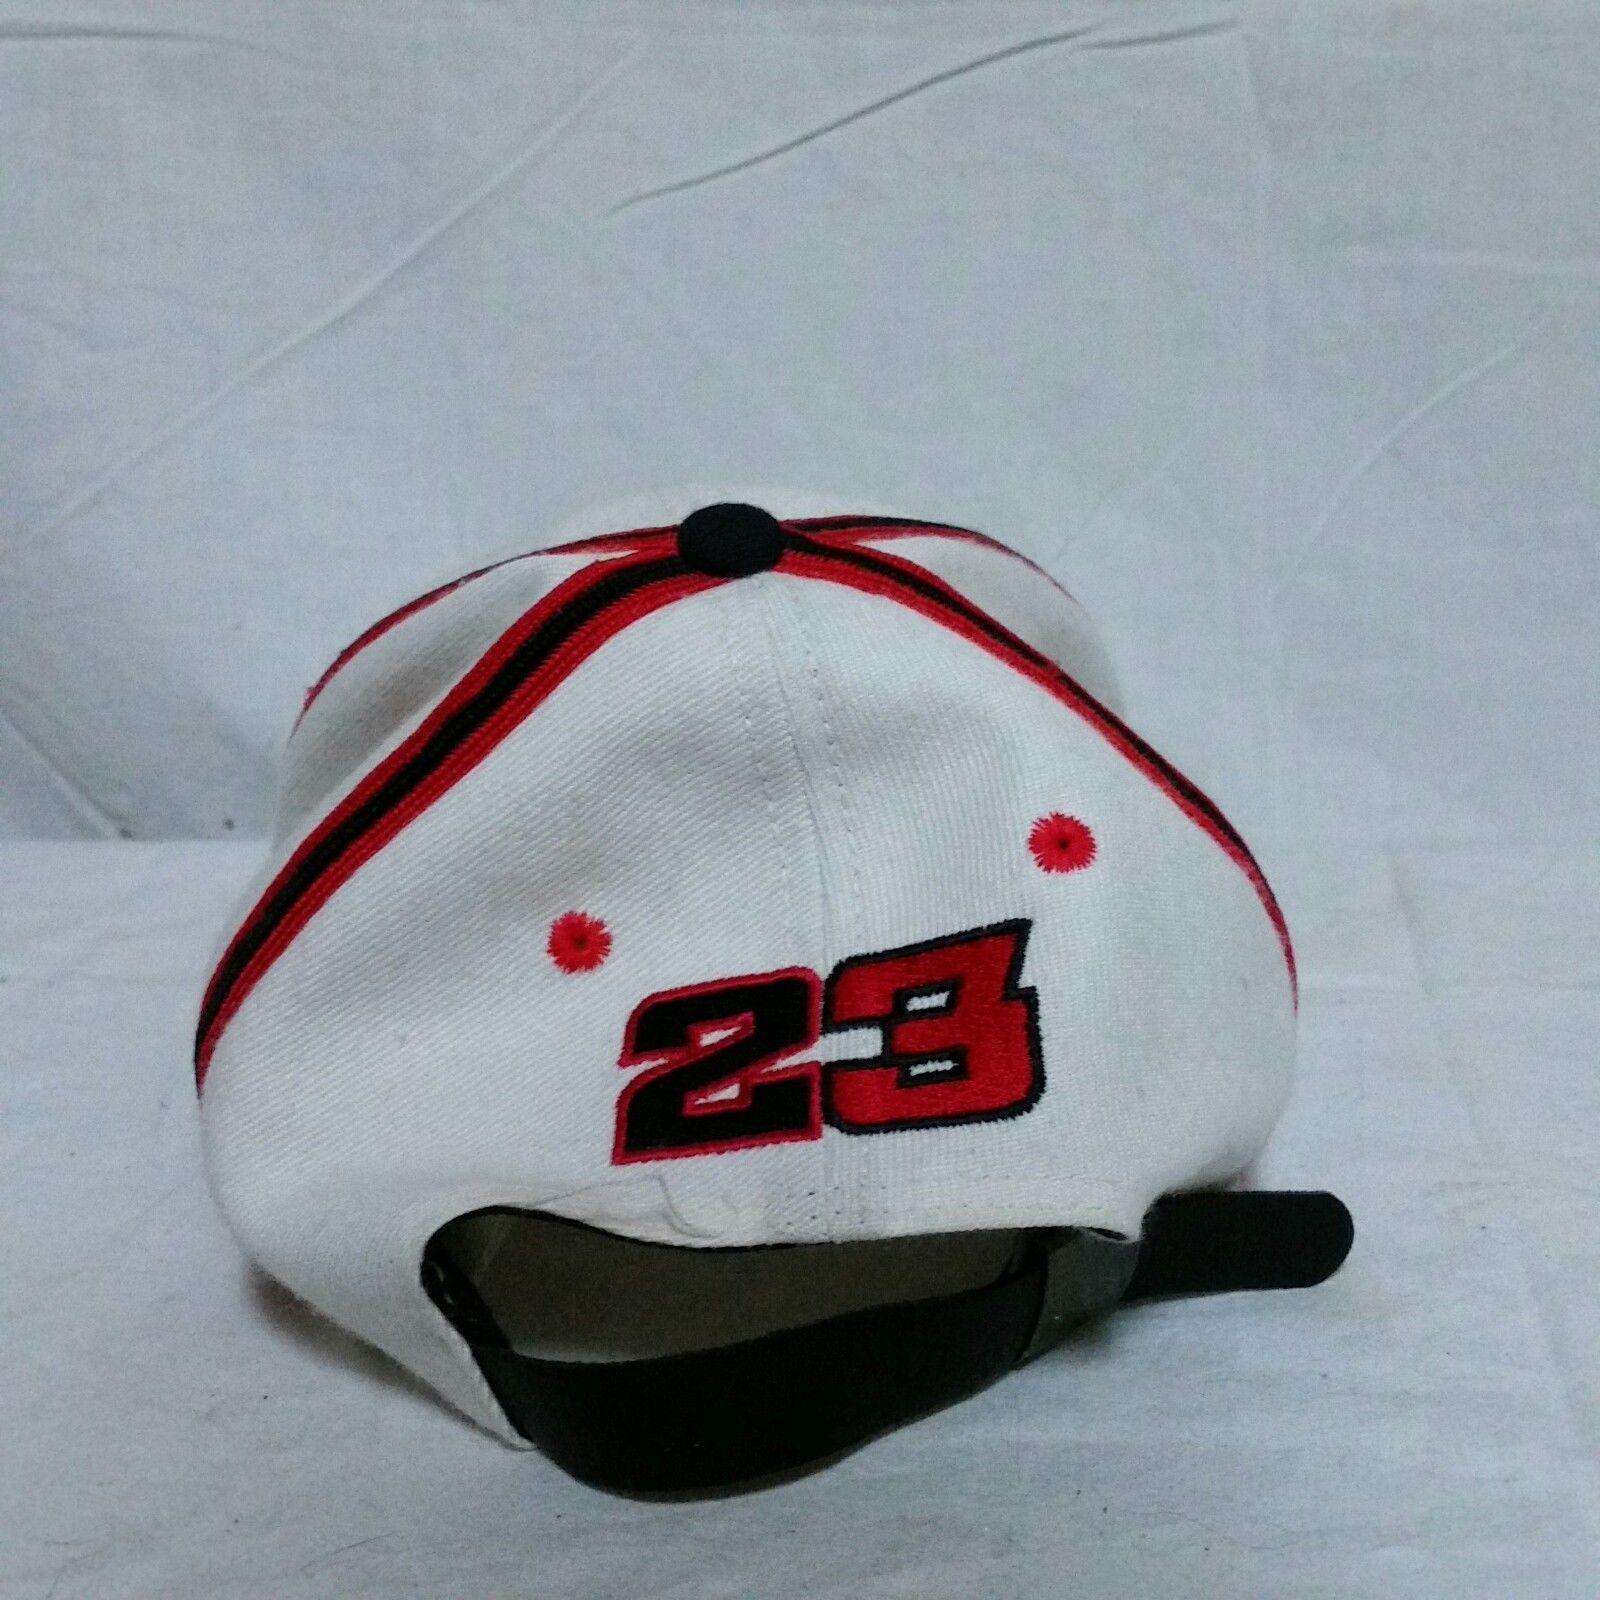 VTG Nike Air Michael Jordan Leather Strapback Hat Cap 90s Retro NBA Basketball